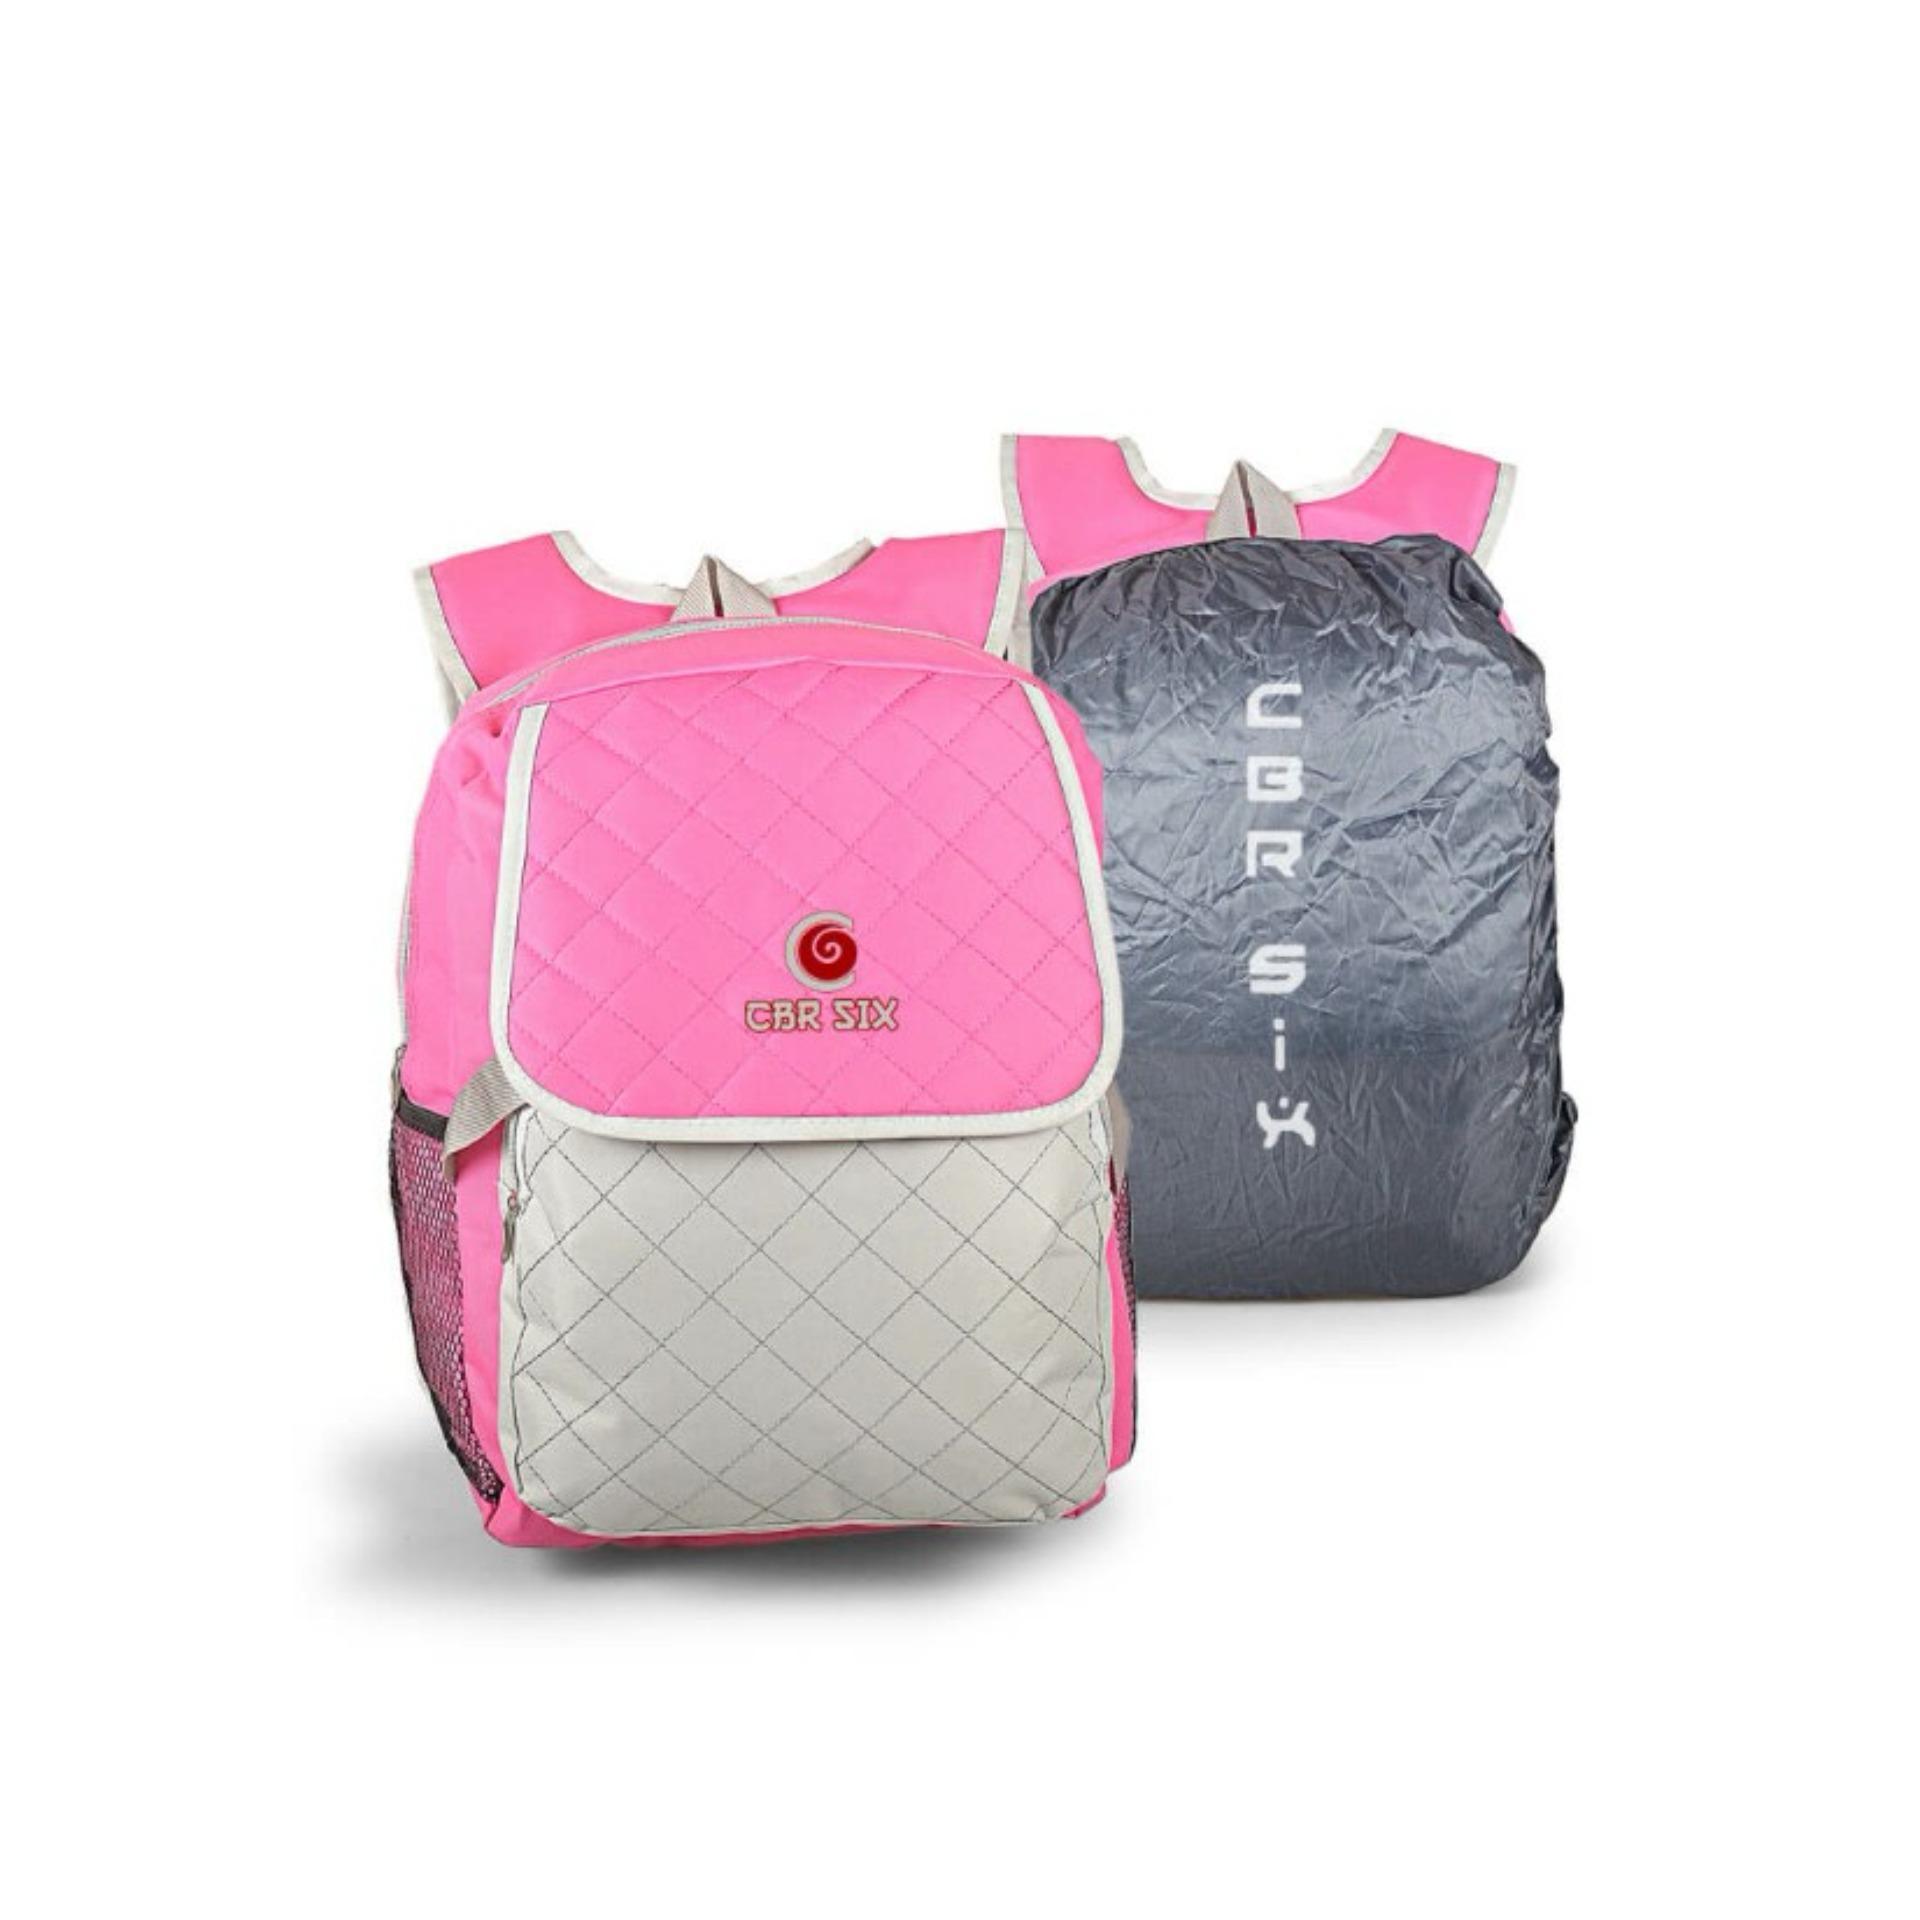 Garucci Tas Ransel Sekolah Anak Perempuan Dinier Tdr 3072 Pink Laki Sintetis Tng 3205 Merah Warna Kom Plus Raincover Cbr Six